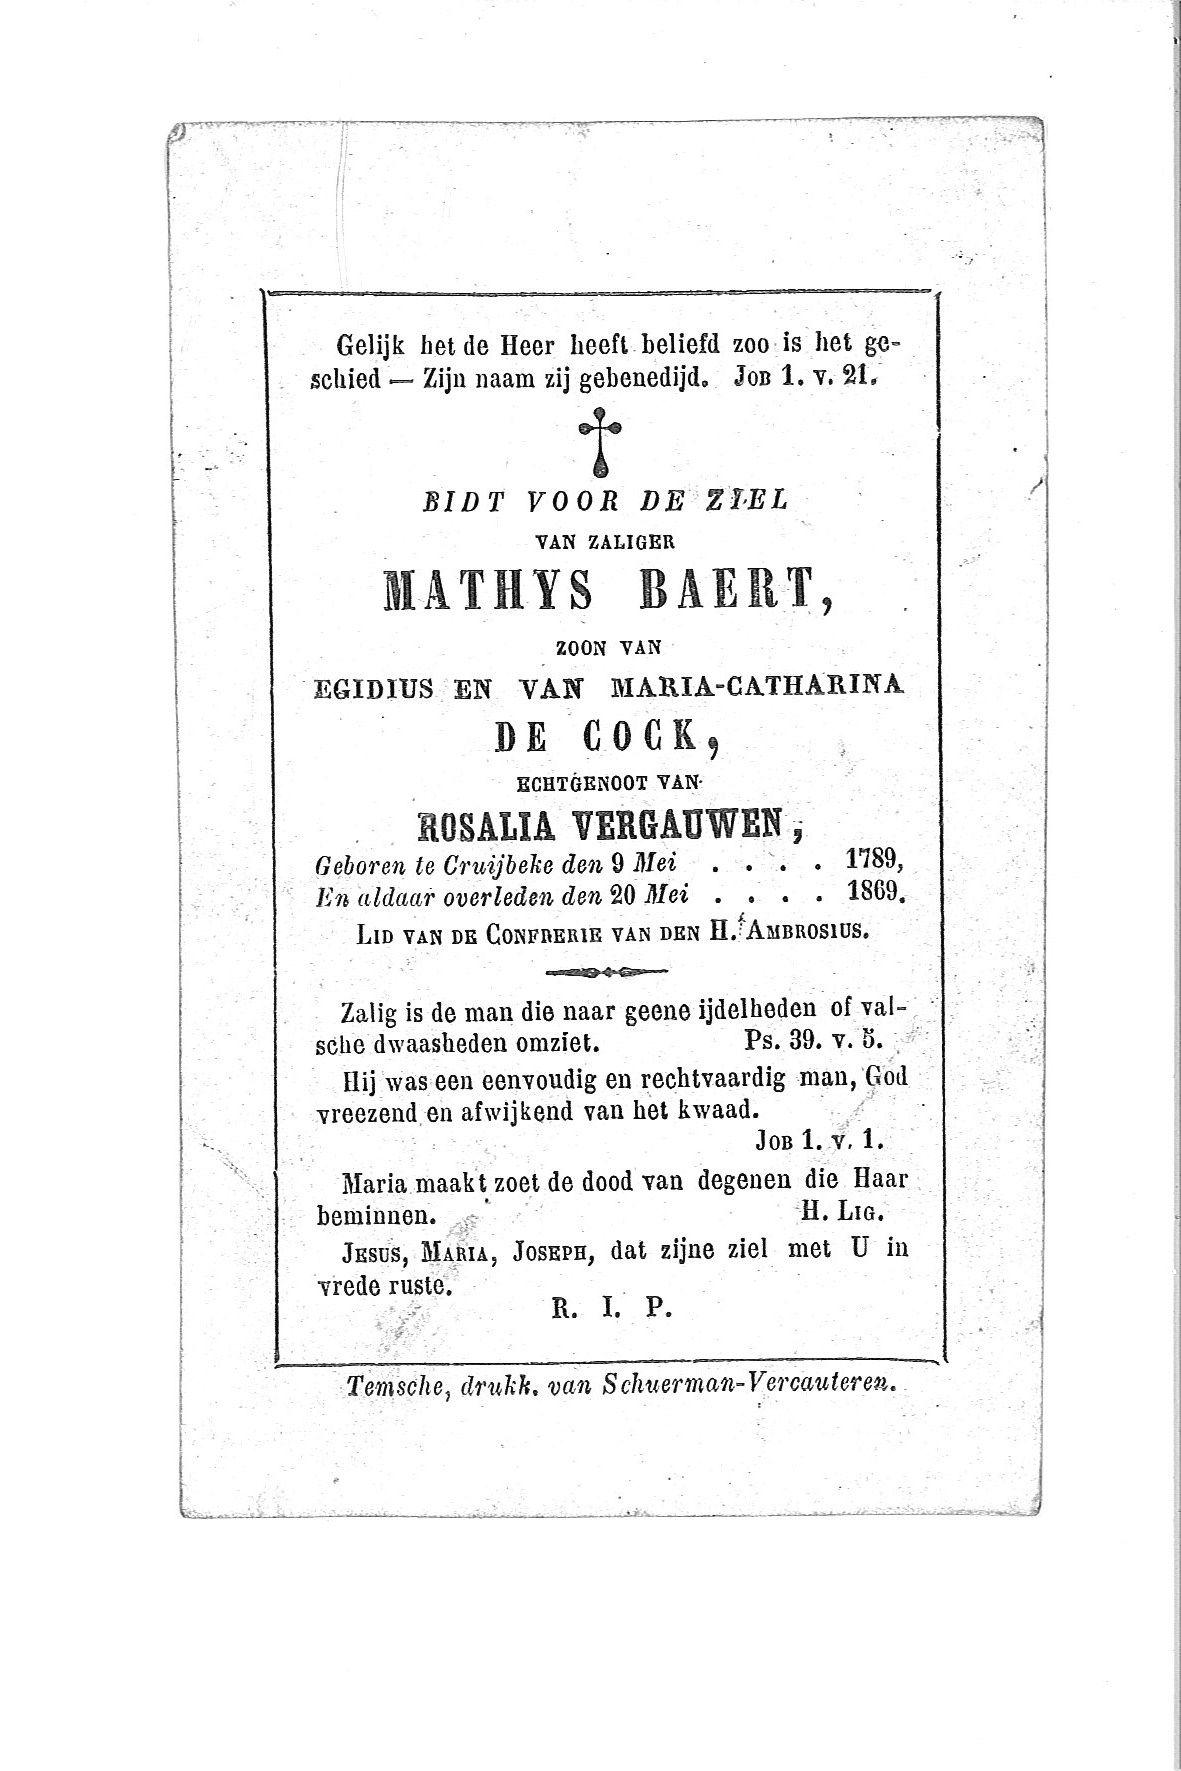 Malthys(1869)s20090803123049_00026.jpg